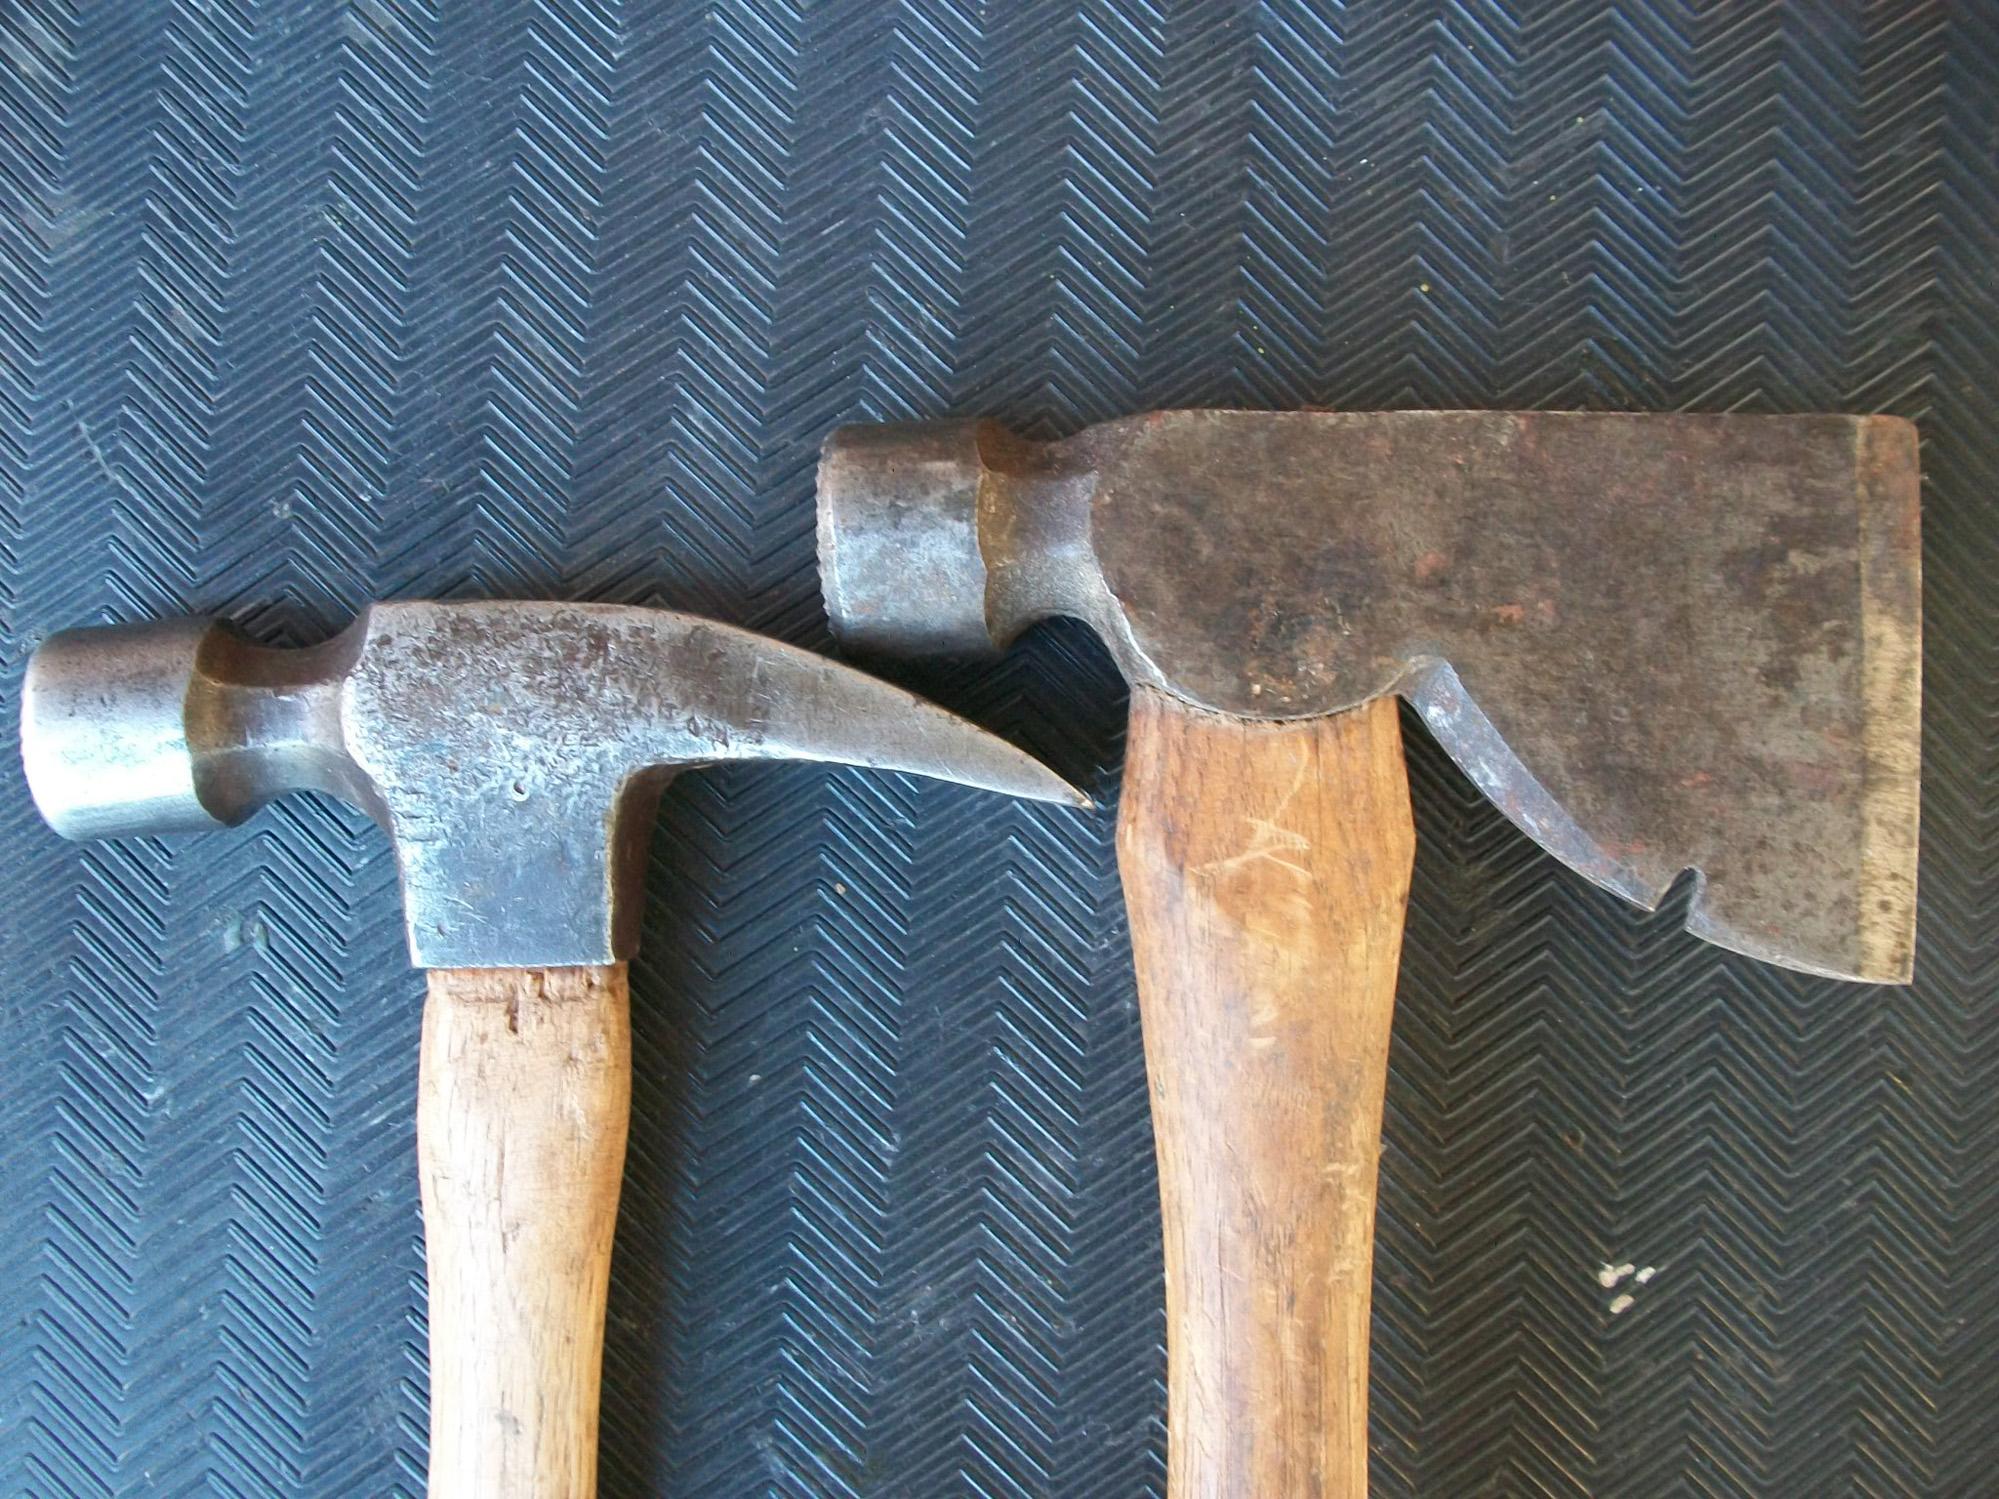 Hammer Vs. Rigging Axe | JLC Online | Hand Tools, Framing, Carpentry